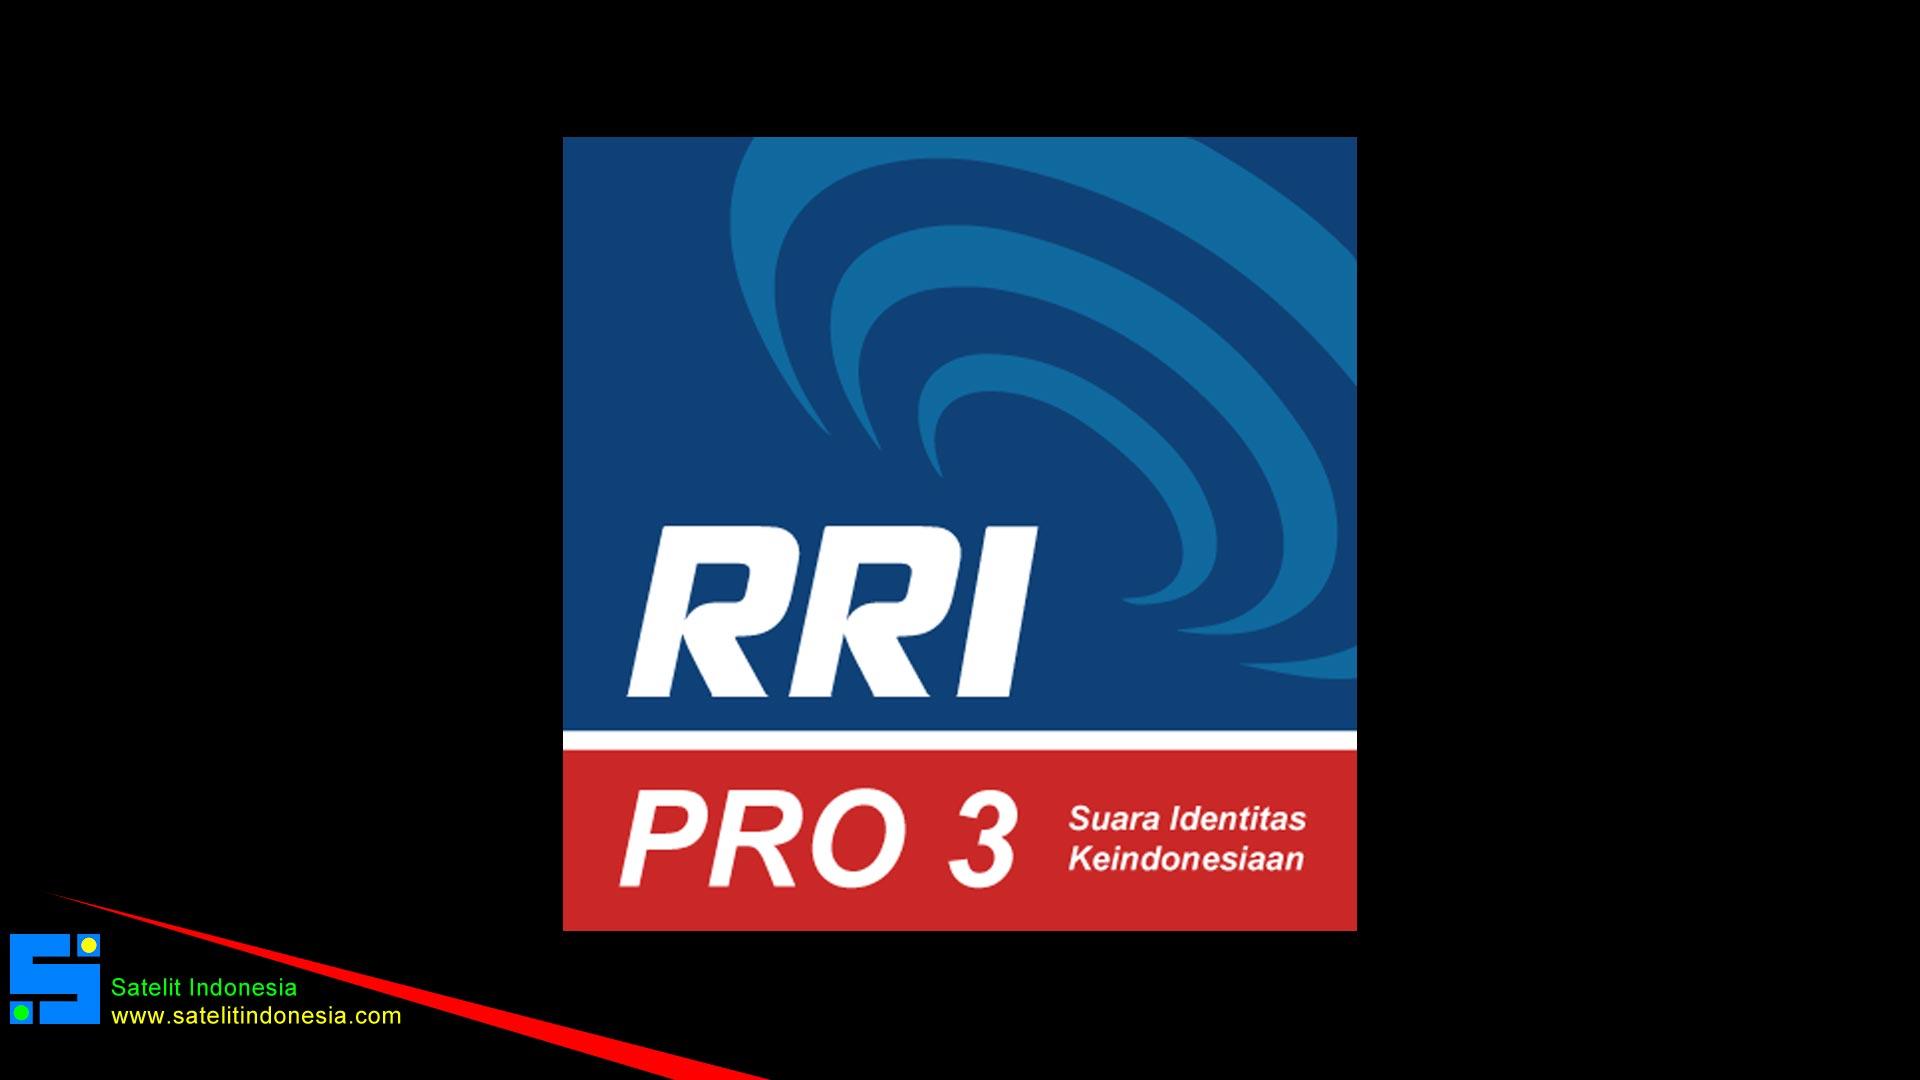 Frekuensi siaran RRI Pro3 Jakarta di satelit Telkom 4 Terbaru